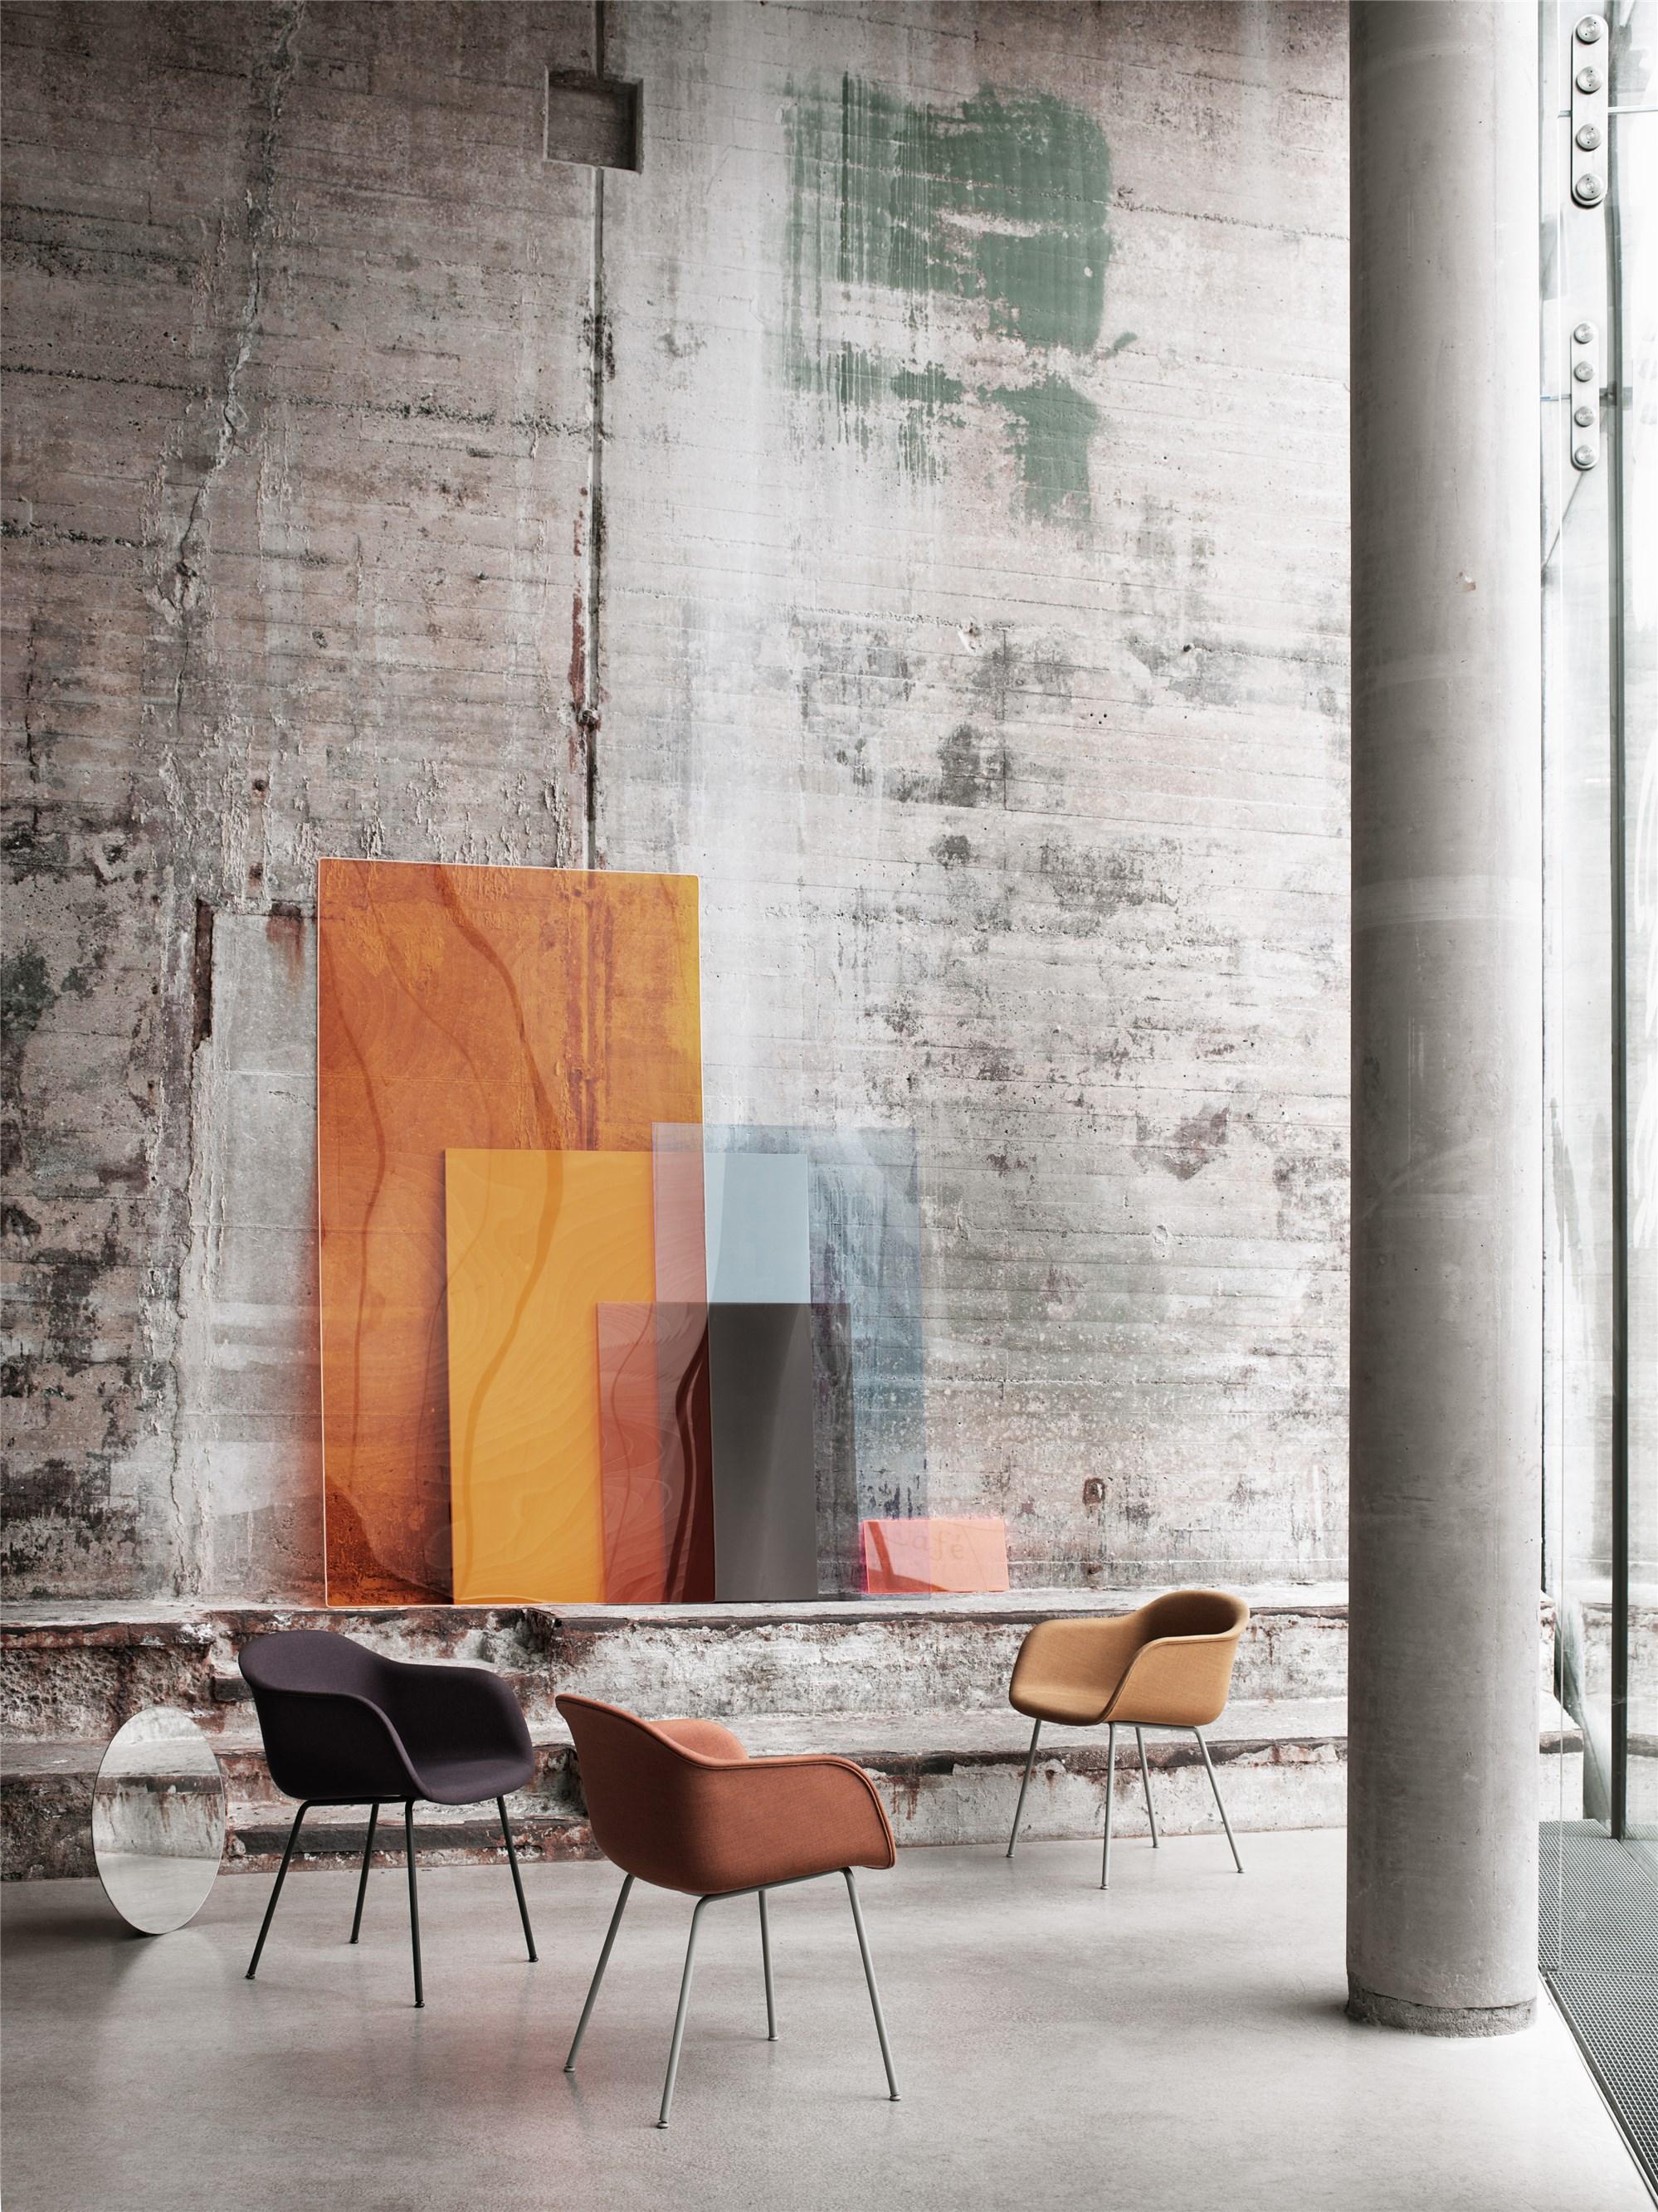 Fiber-armchair-tube-remix-373-433-452-high-res-lifestyle_(150).jpg